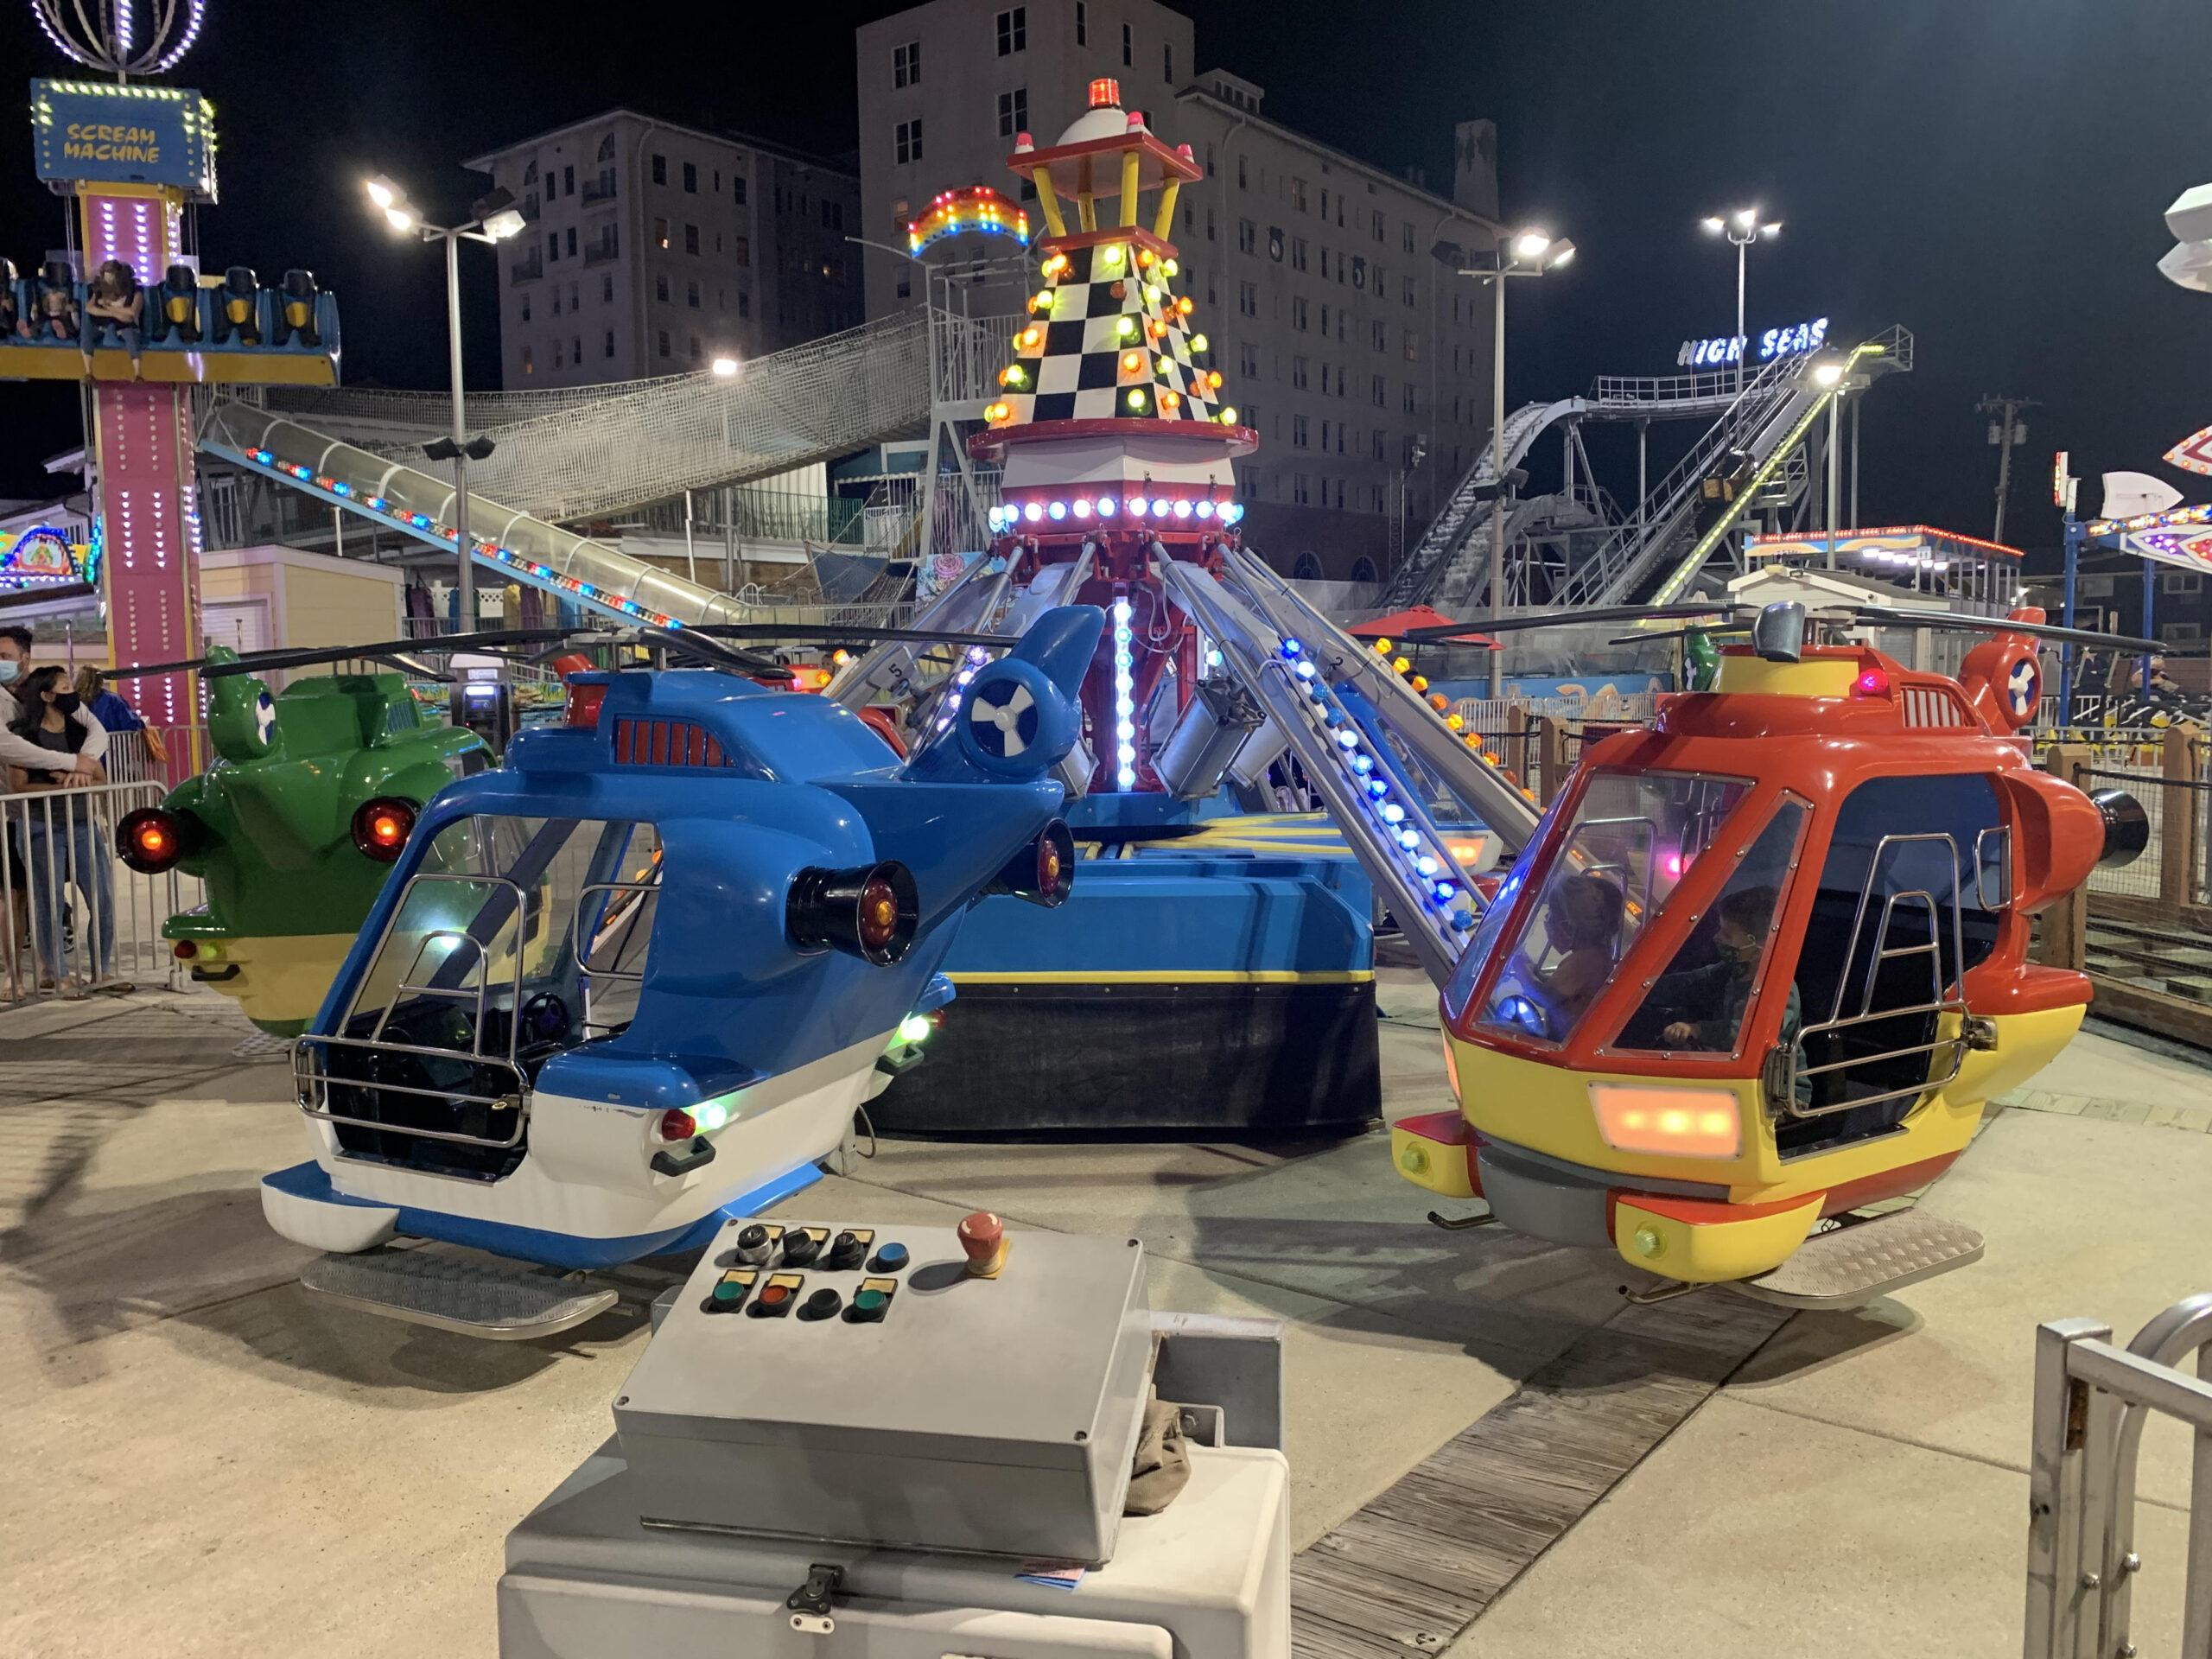 2002 Zamperla Helicopters